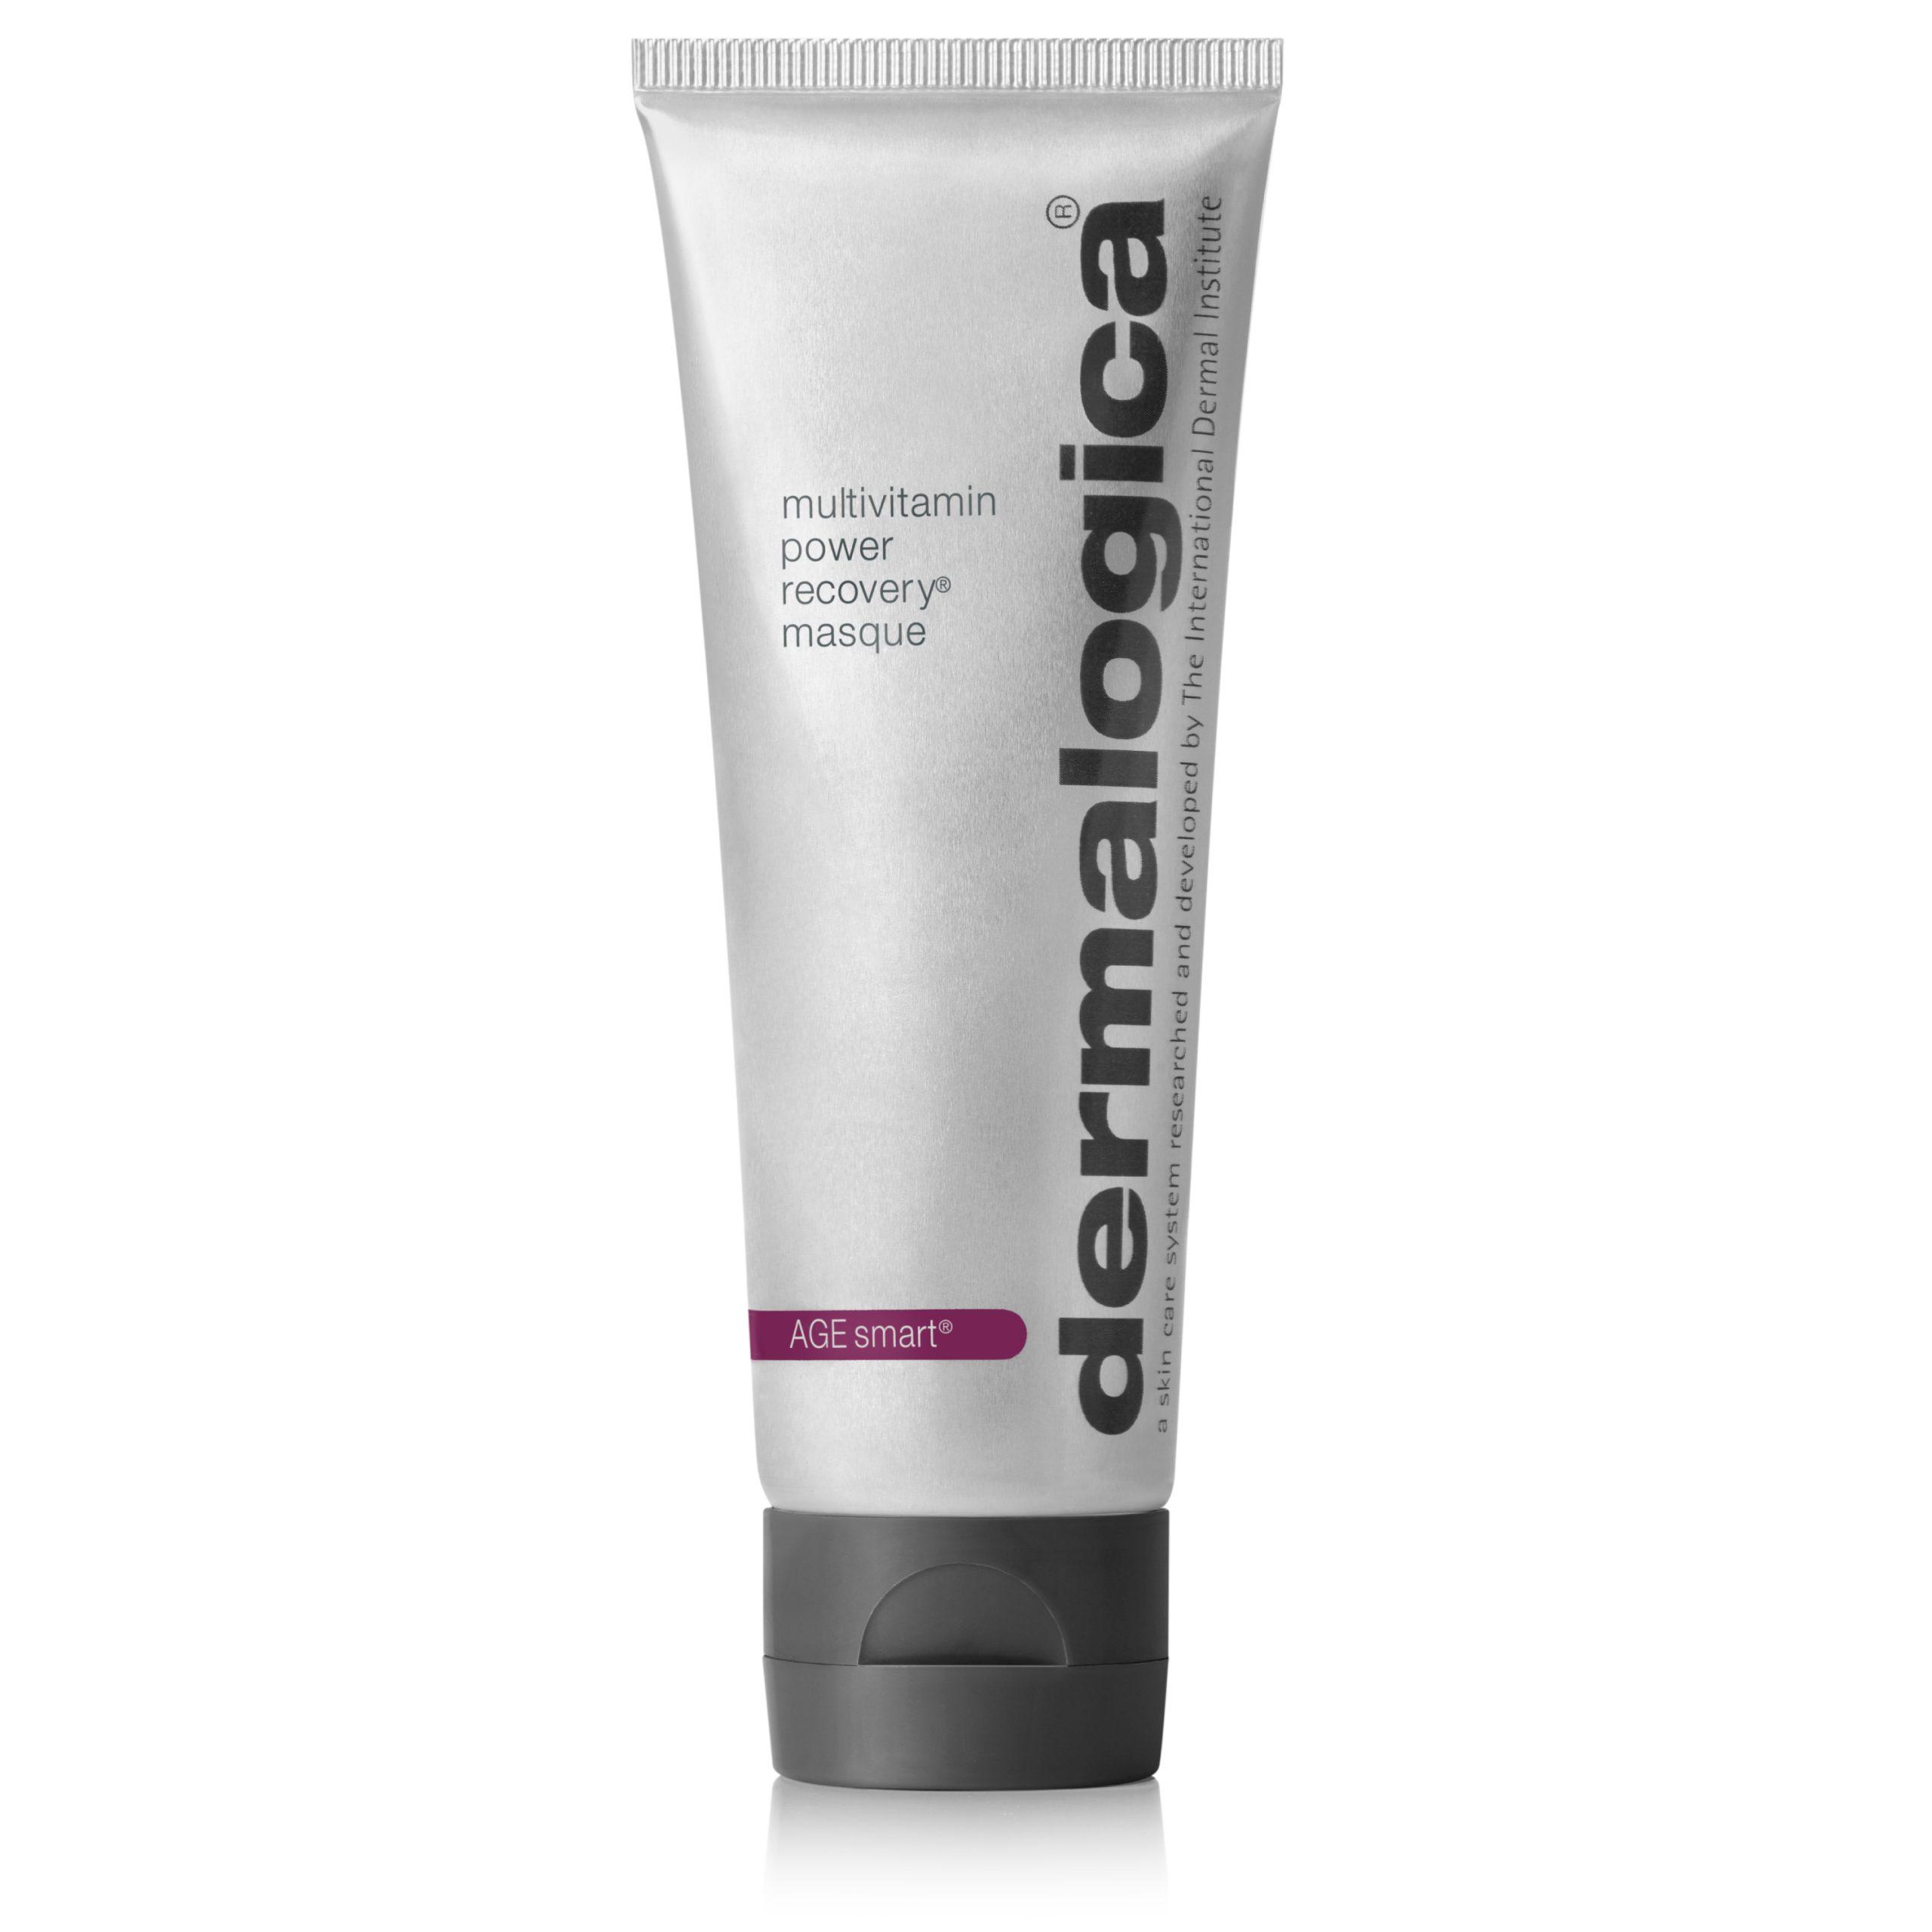 Multivitamin power recovery® masque 75ml